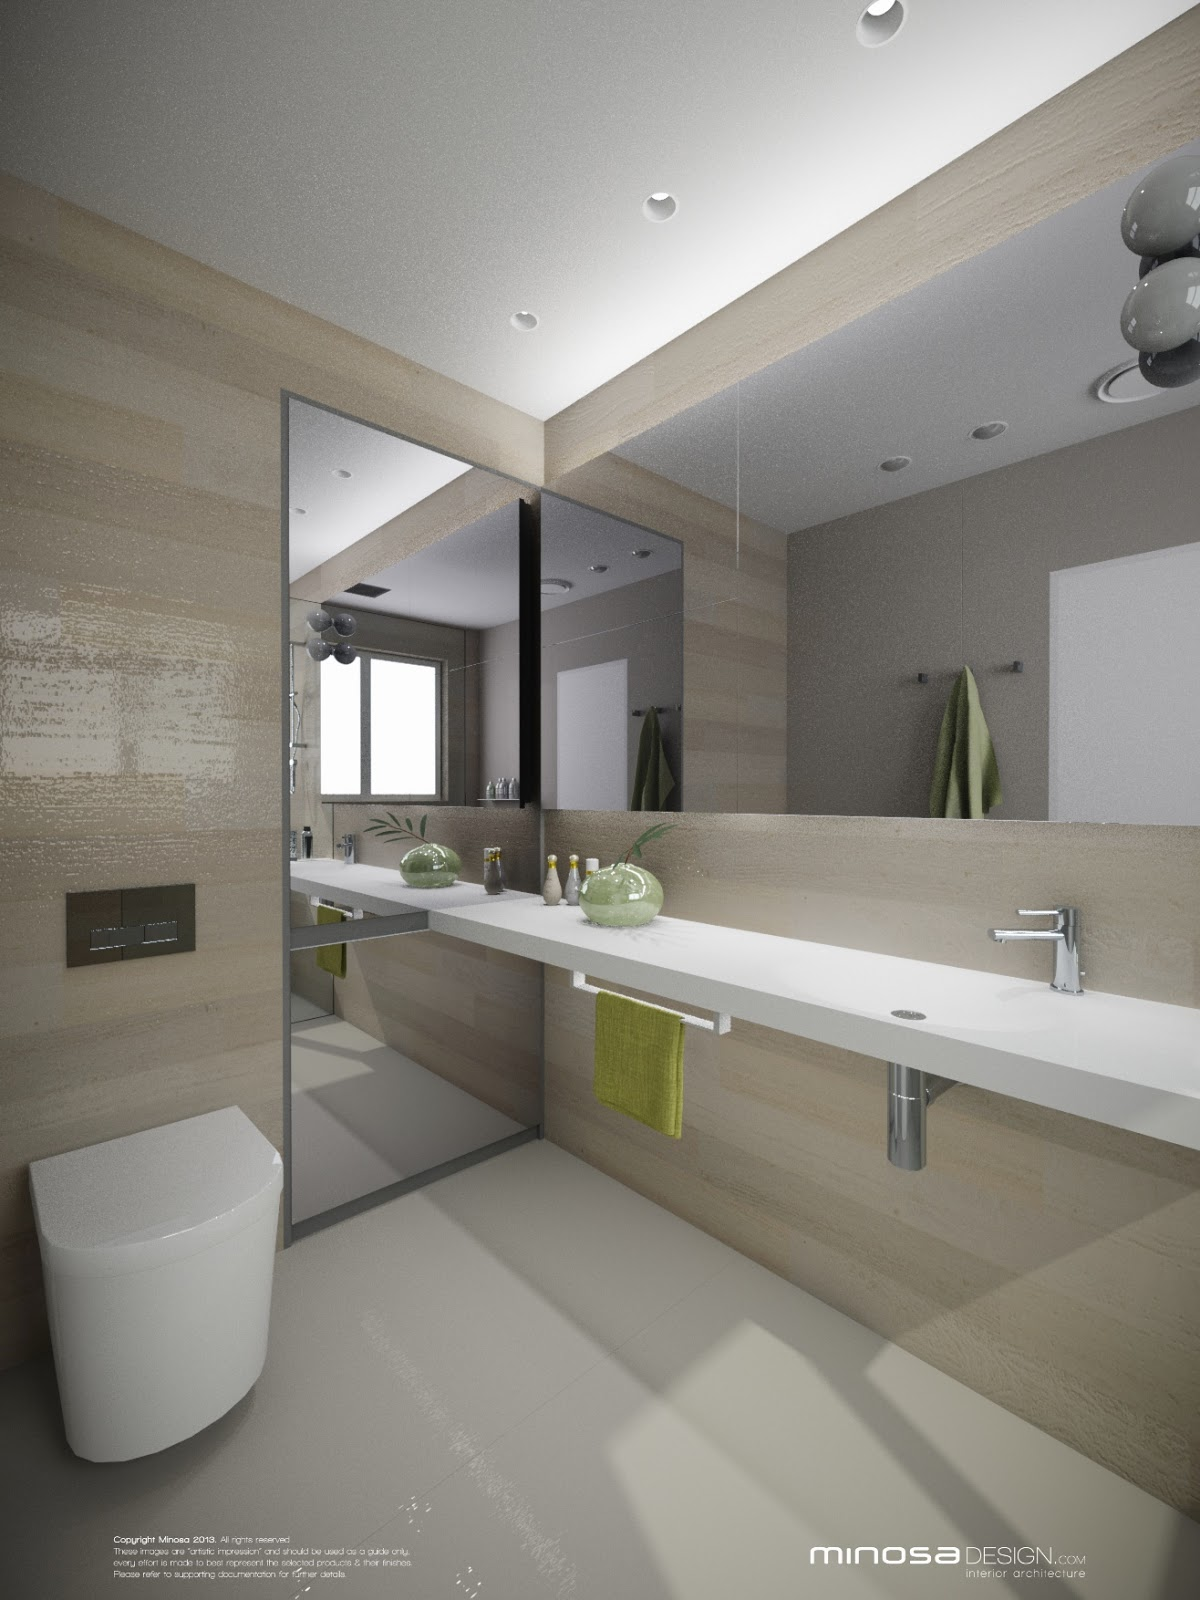 Minosa Bringing Sexy Back The Modern Bathroom